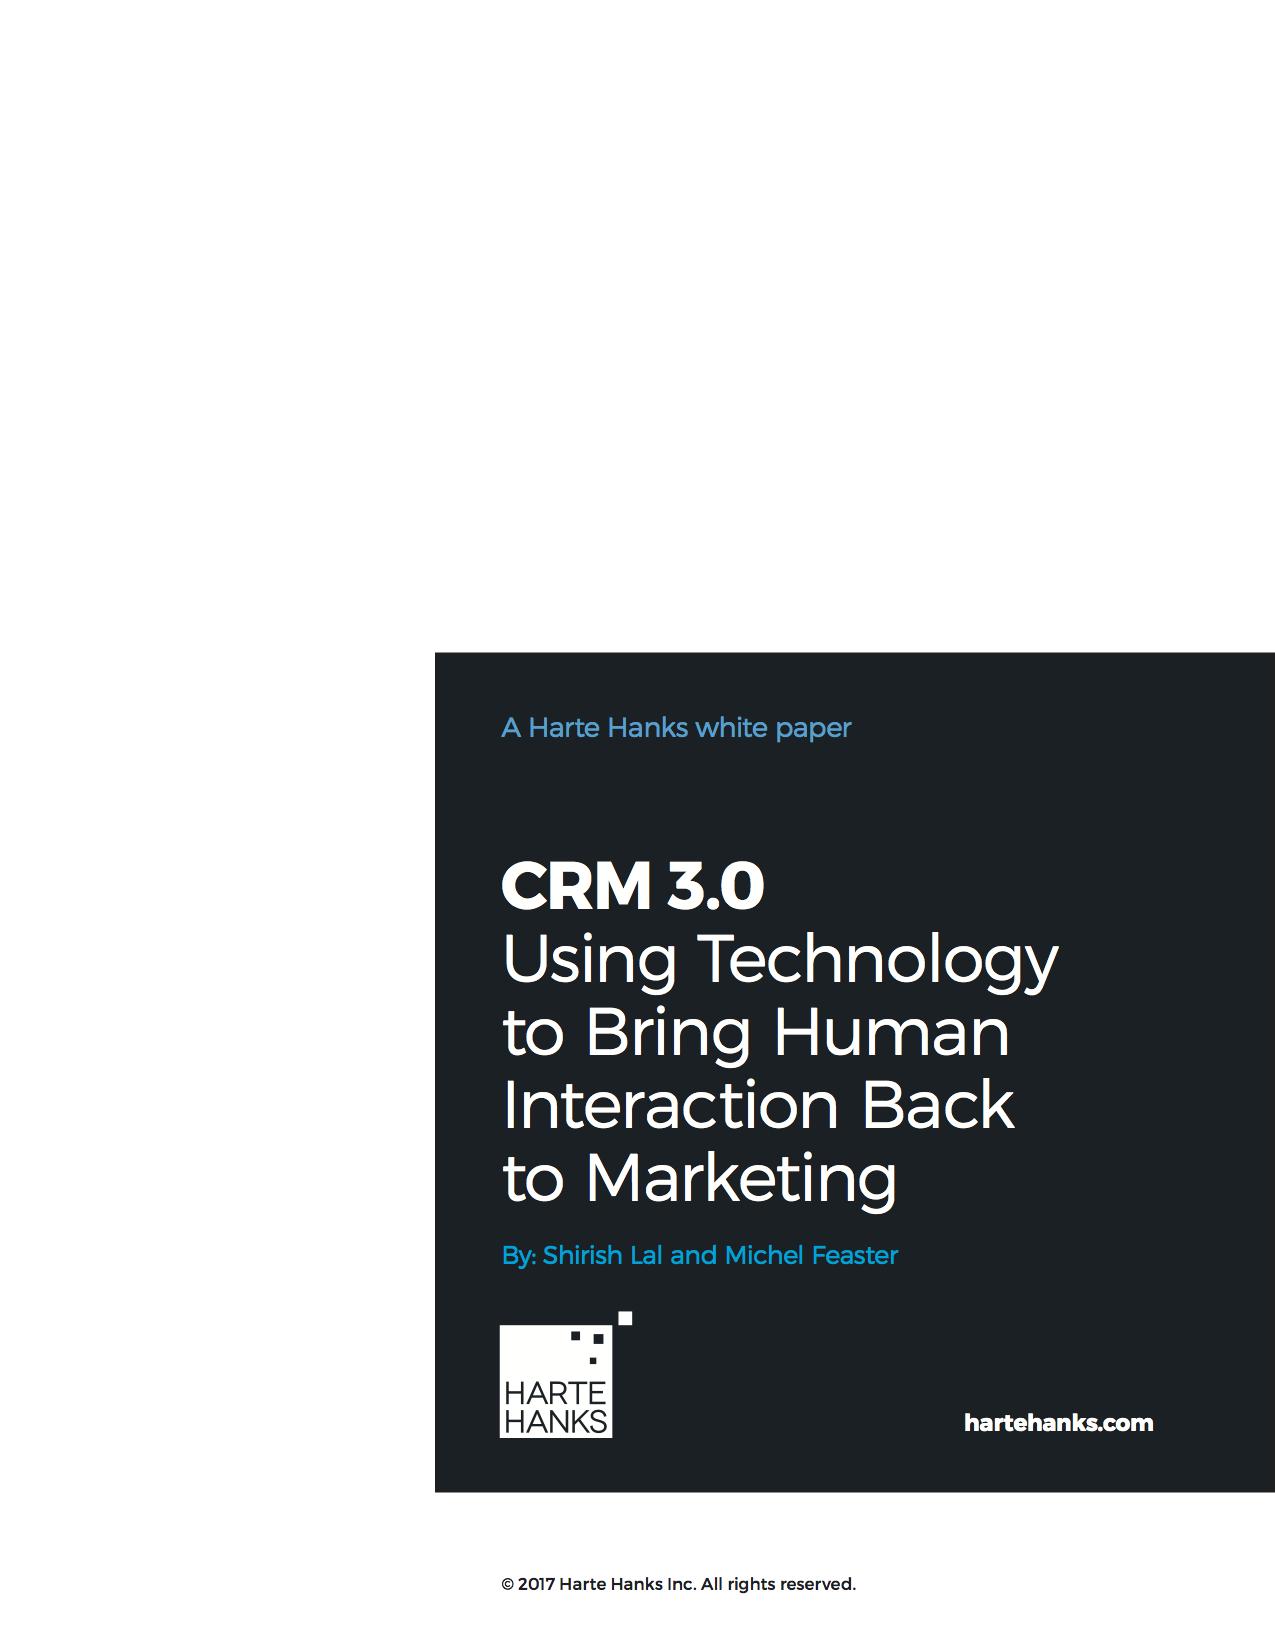 Harte Hanks: CRM 3.0